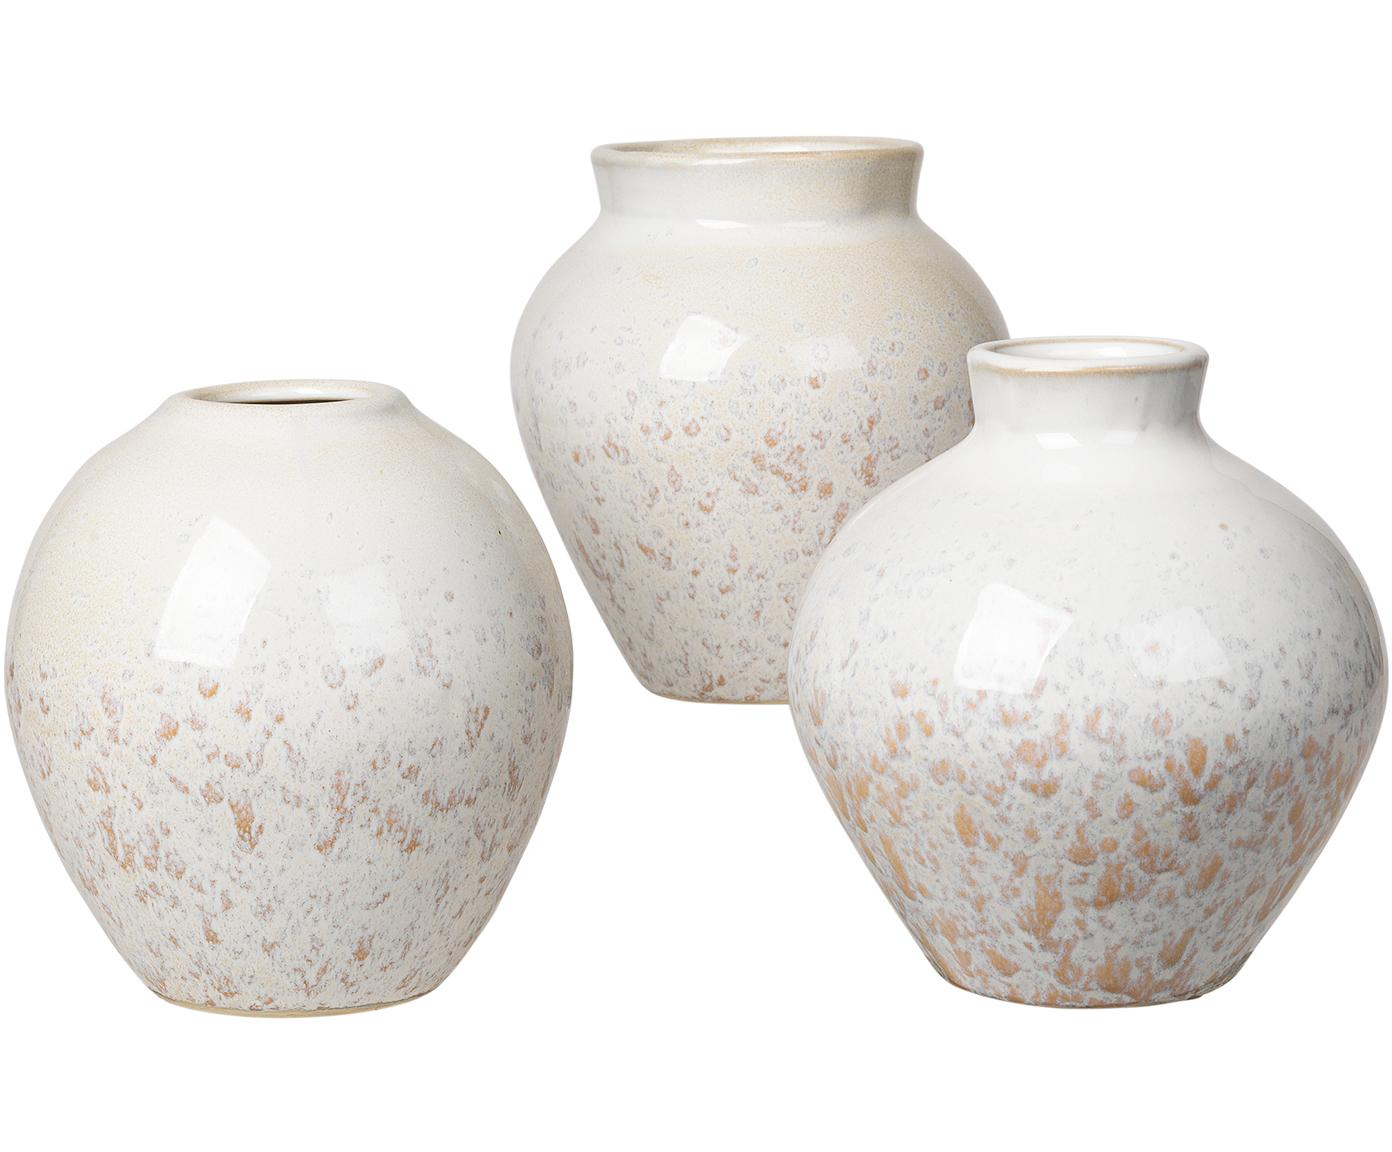 Set de jarrones de cerámica Ingrid, 3pzas., Cerámica, Blanco, tonos beige, Ø 14 x Al 14 cm